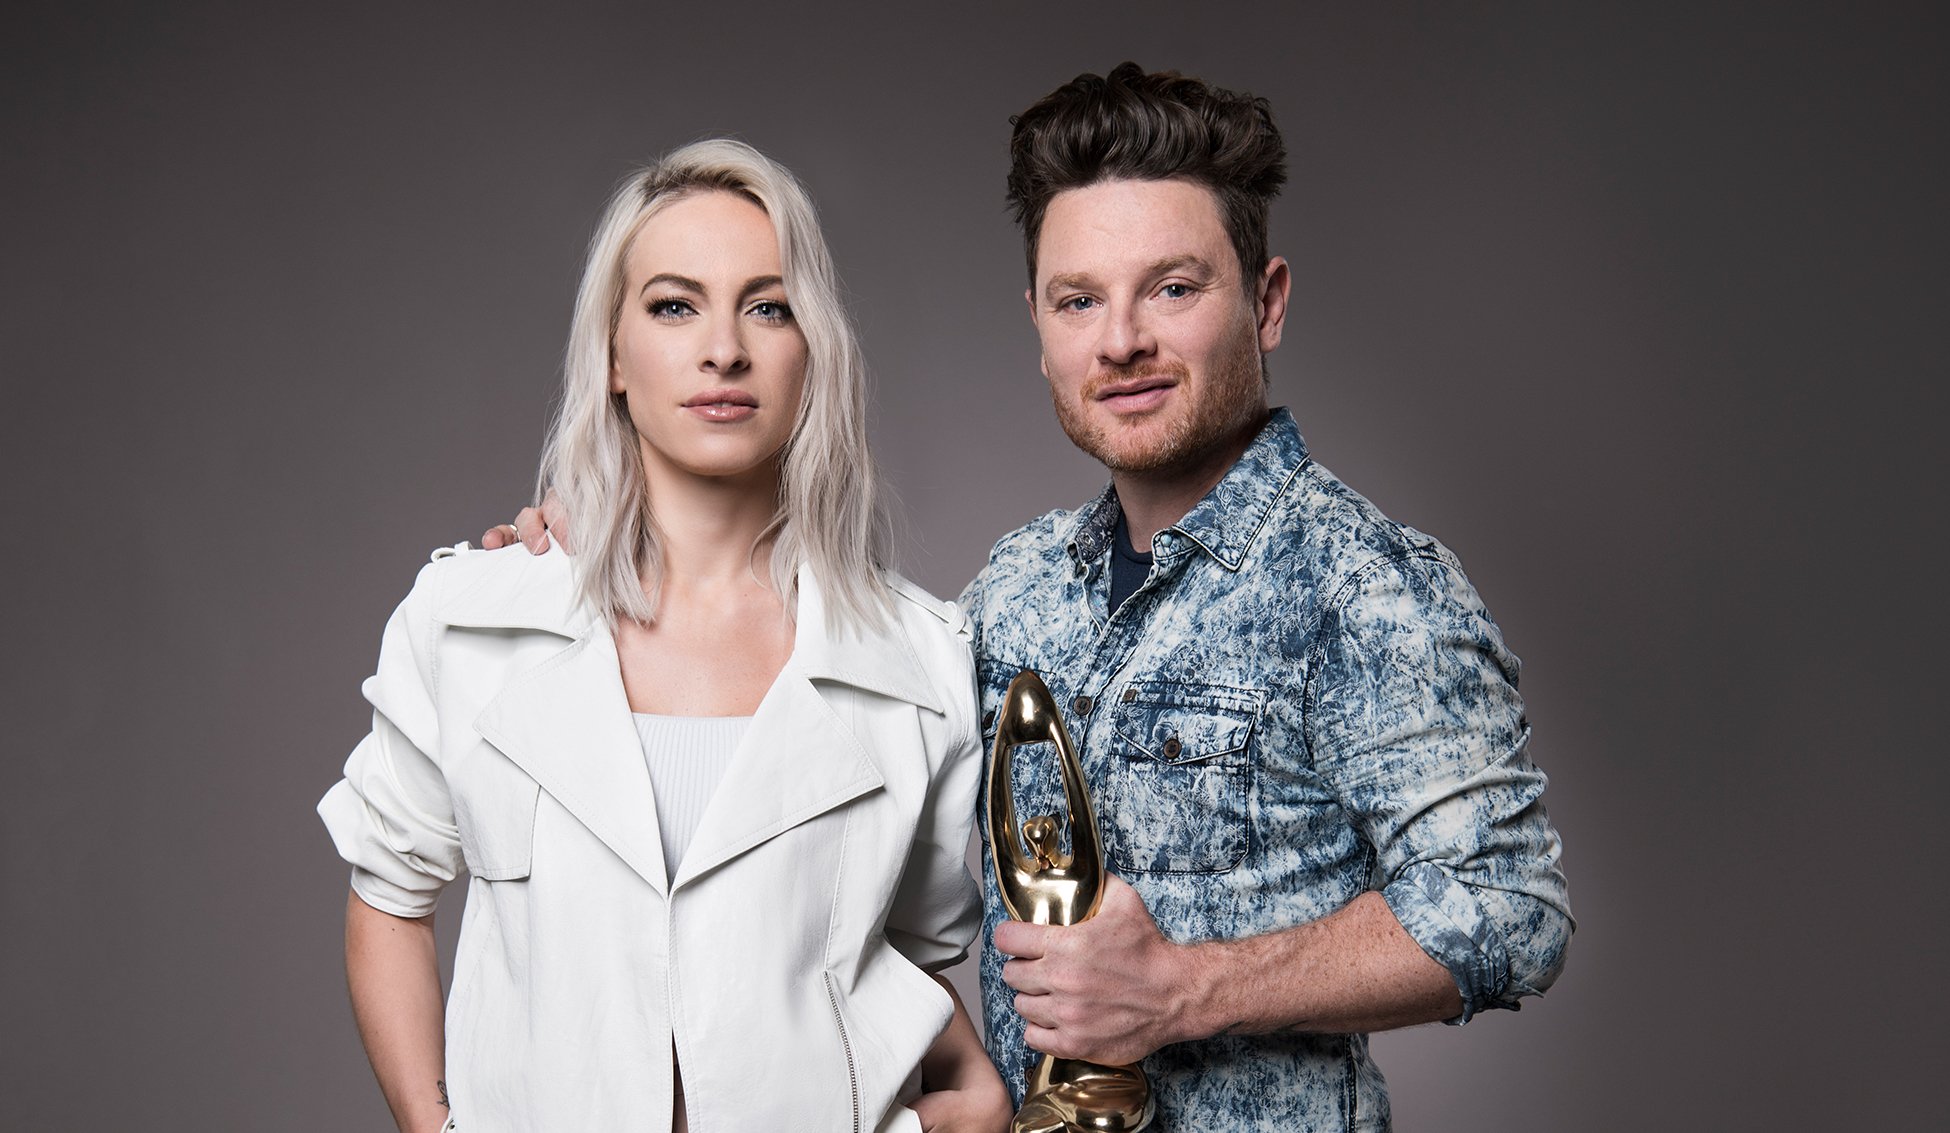 Marie-Mai et Yann Perreau co-animeront le Premier Gala de l'ADISQ